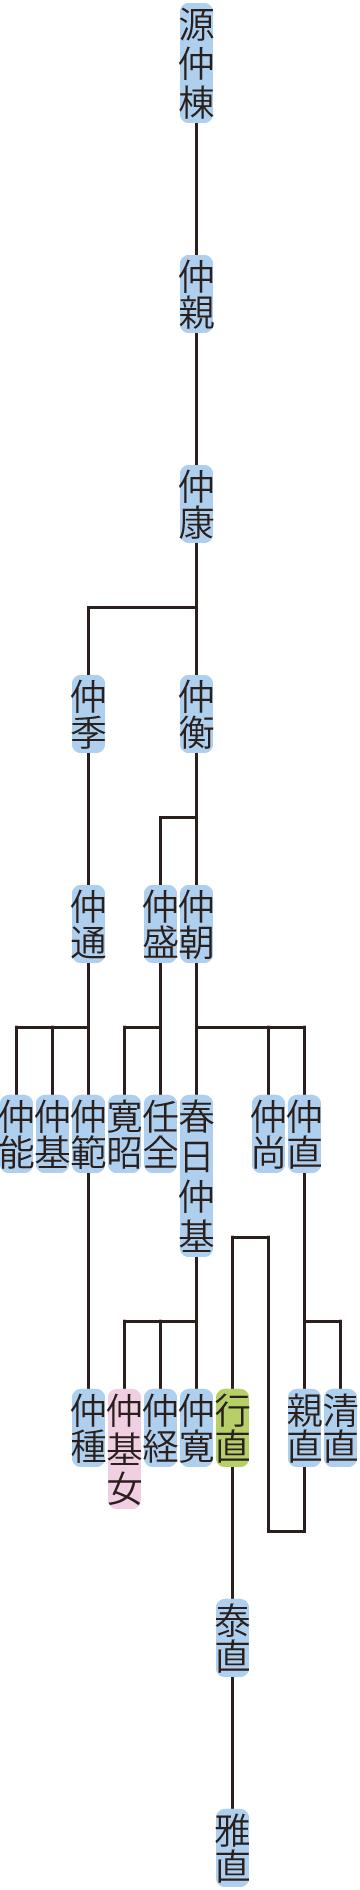 源仲康~仲朝の系図